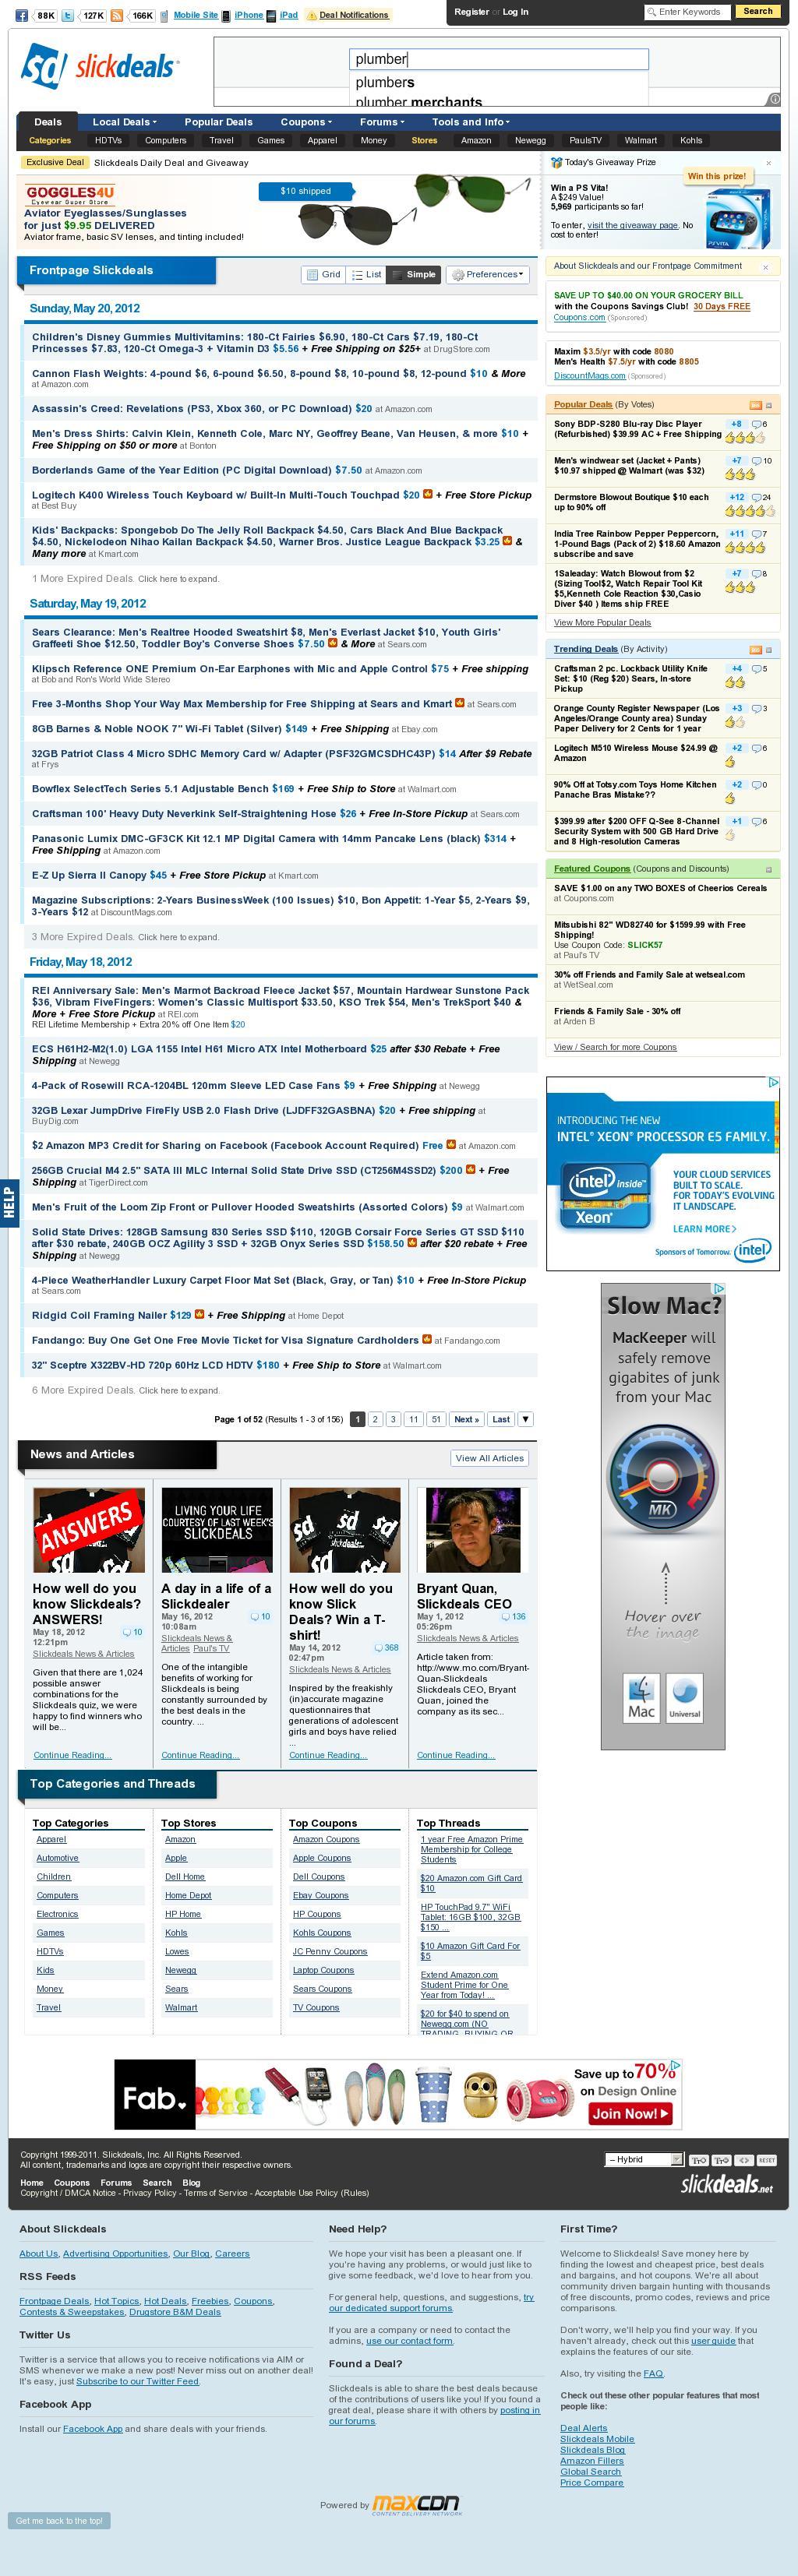 Deal sites, Slickdeals, Promo codes